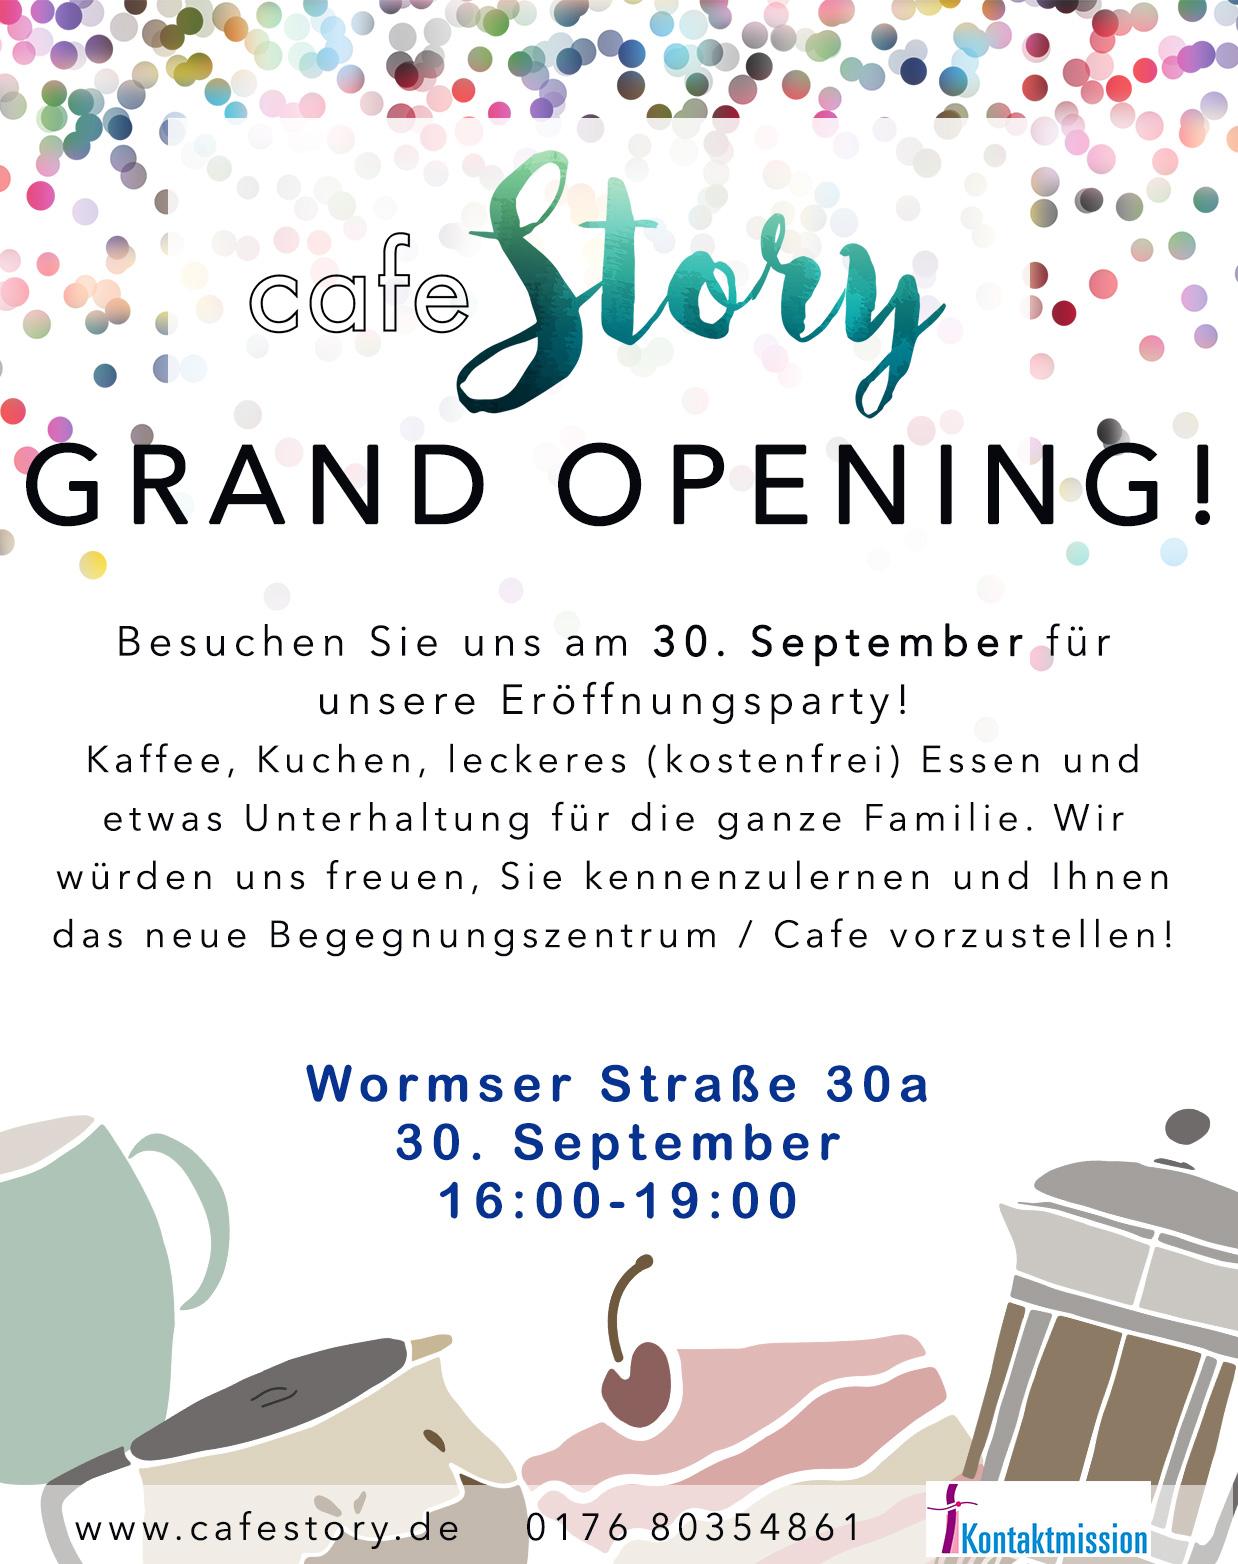 grand-opening-invite.jpg